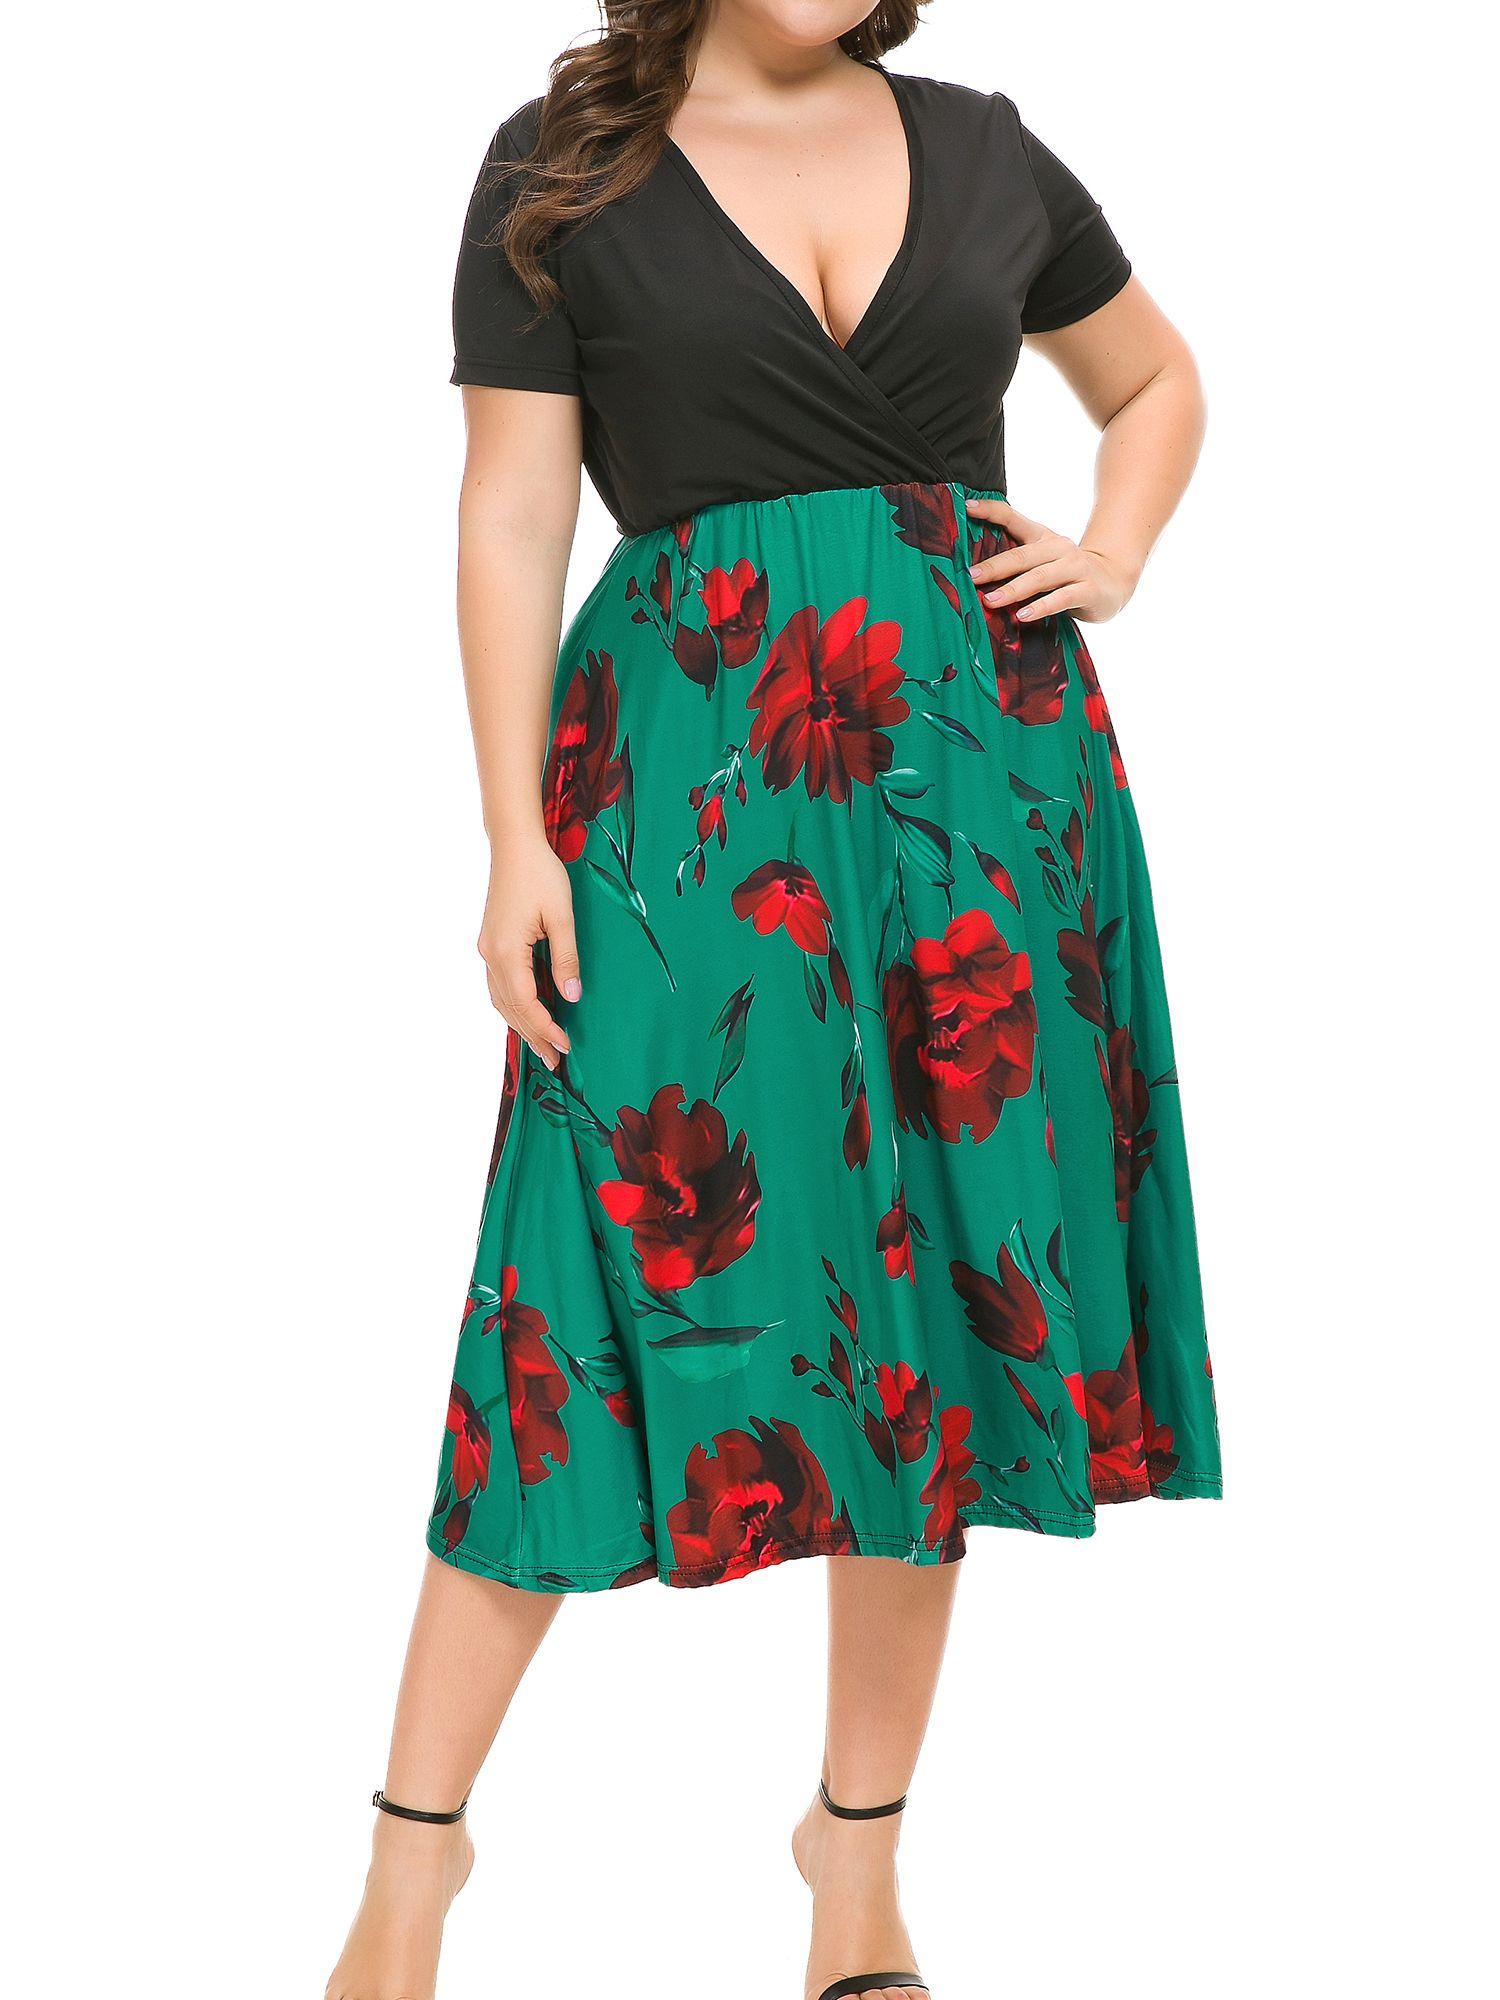 Boho Summer Dress Plus Size Women Bodycon Wrap V Neck Floral Prom Midi Short Sleeve Evening Cocktail Big Size Boho Summer Dresses Big Size Dress Summer Dresses [ 2000 x 1500 Pixel ]